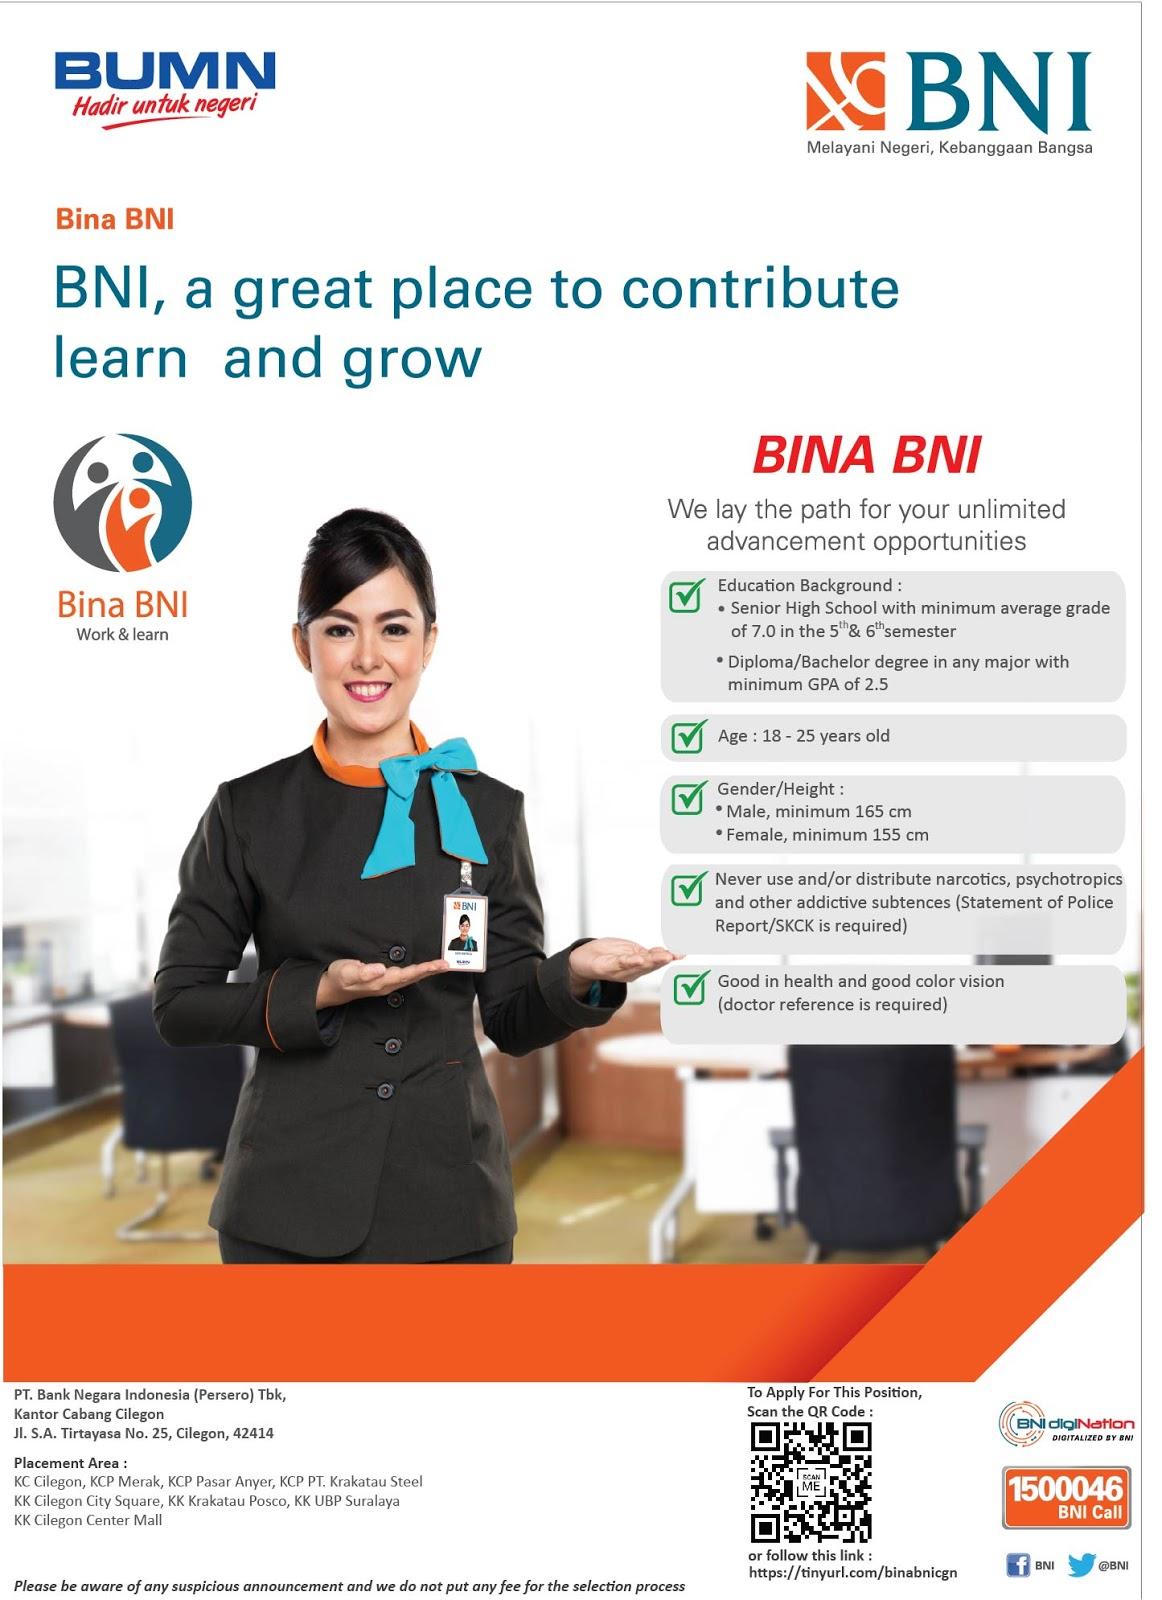 Lowongan Kerja Bina BNI PT. Bank Negara Indonesia (Persero) Tbk KC Cilegon